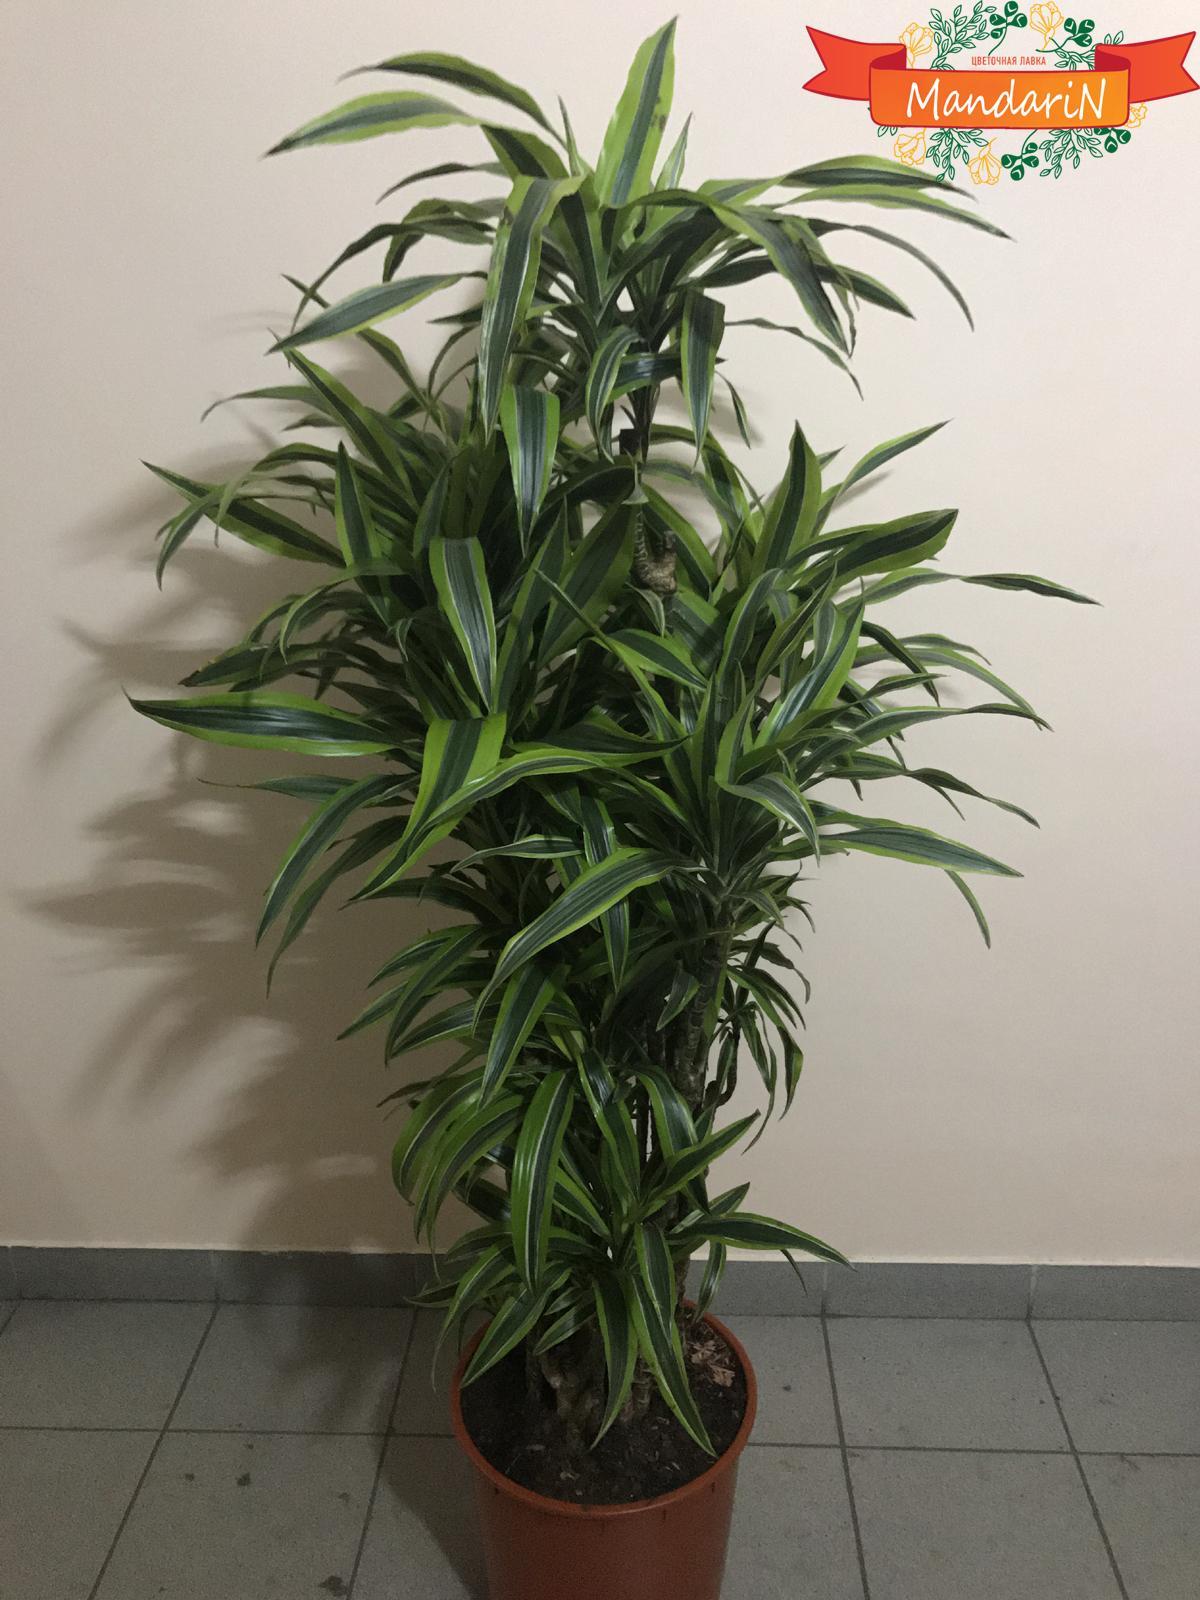 Комнатные цветы пальмы драцены фото и названия